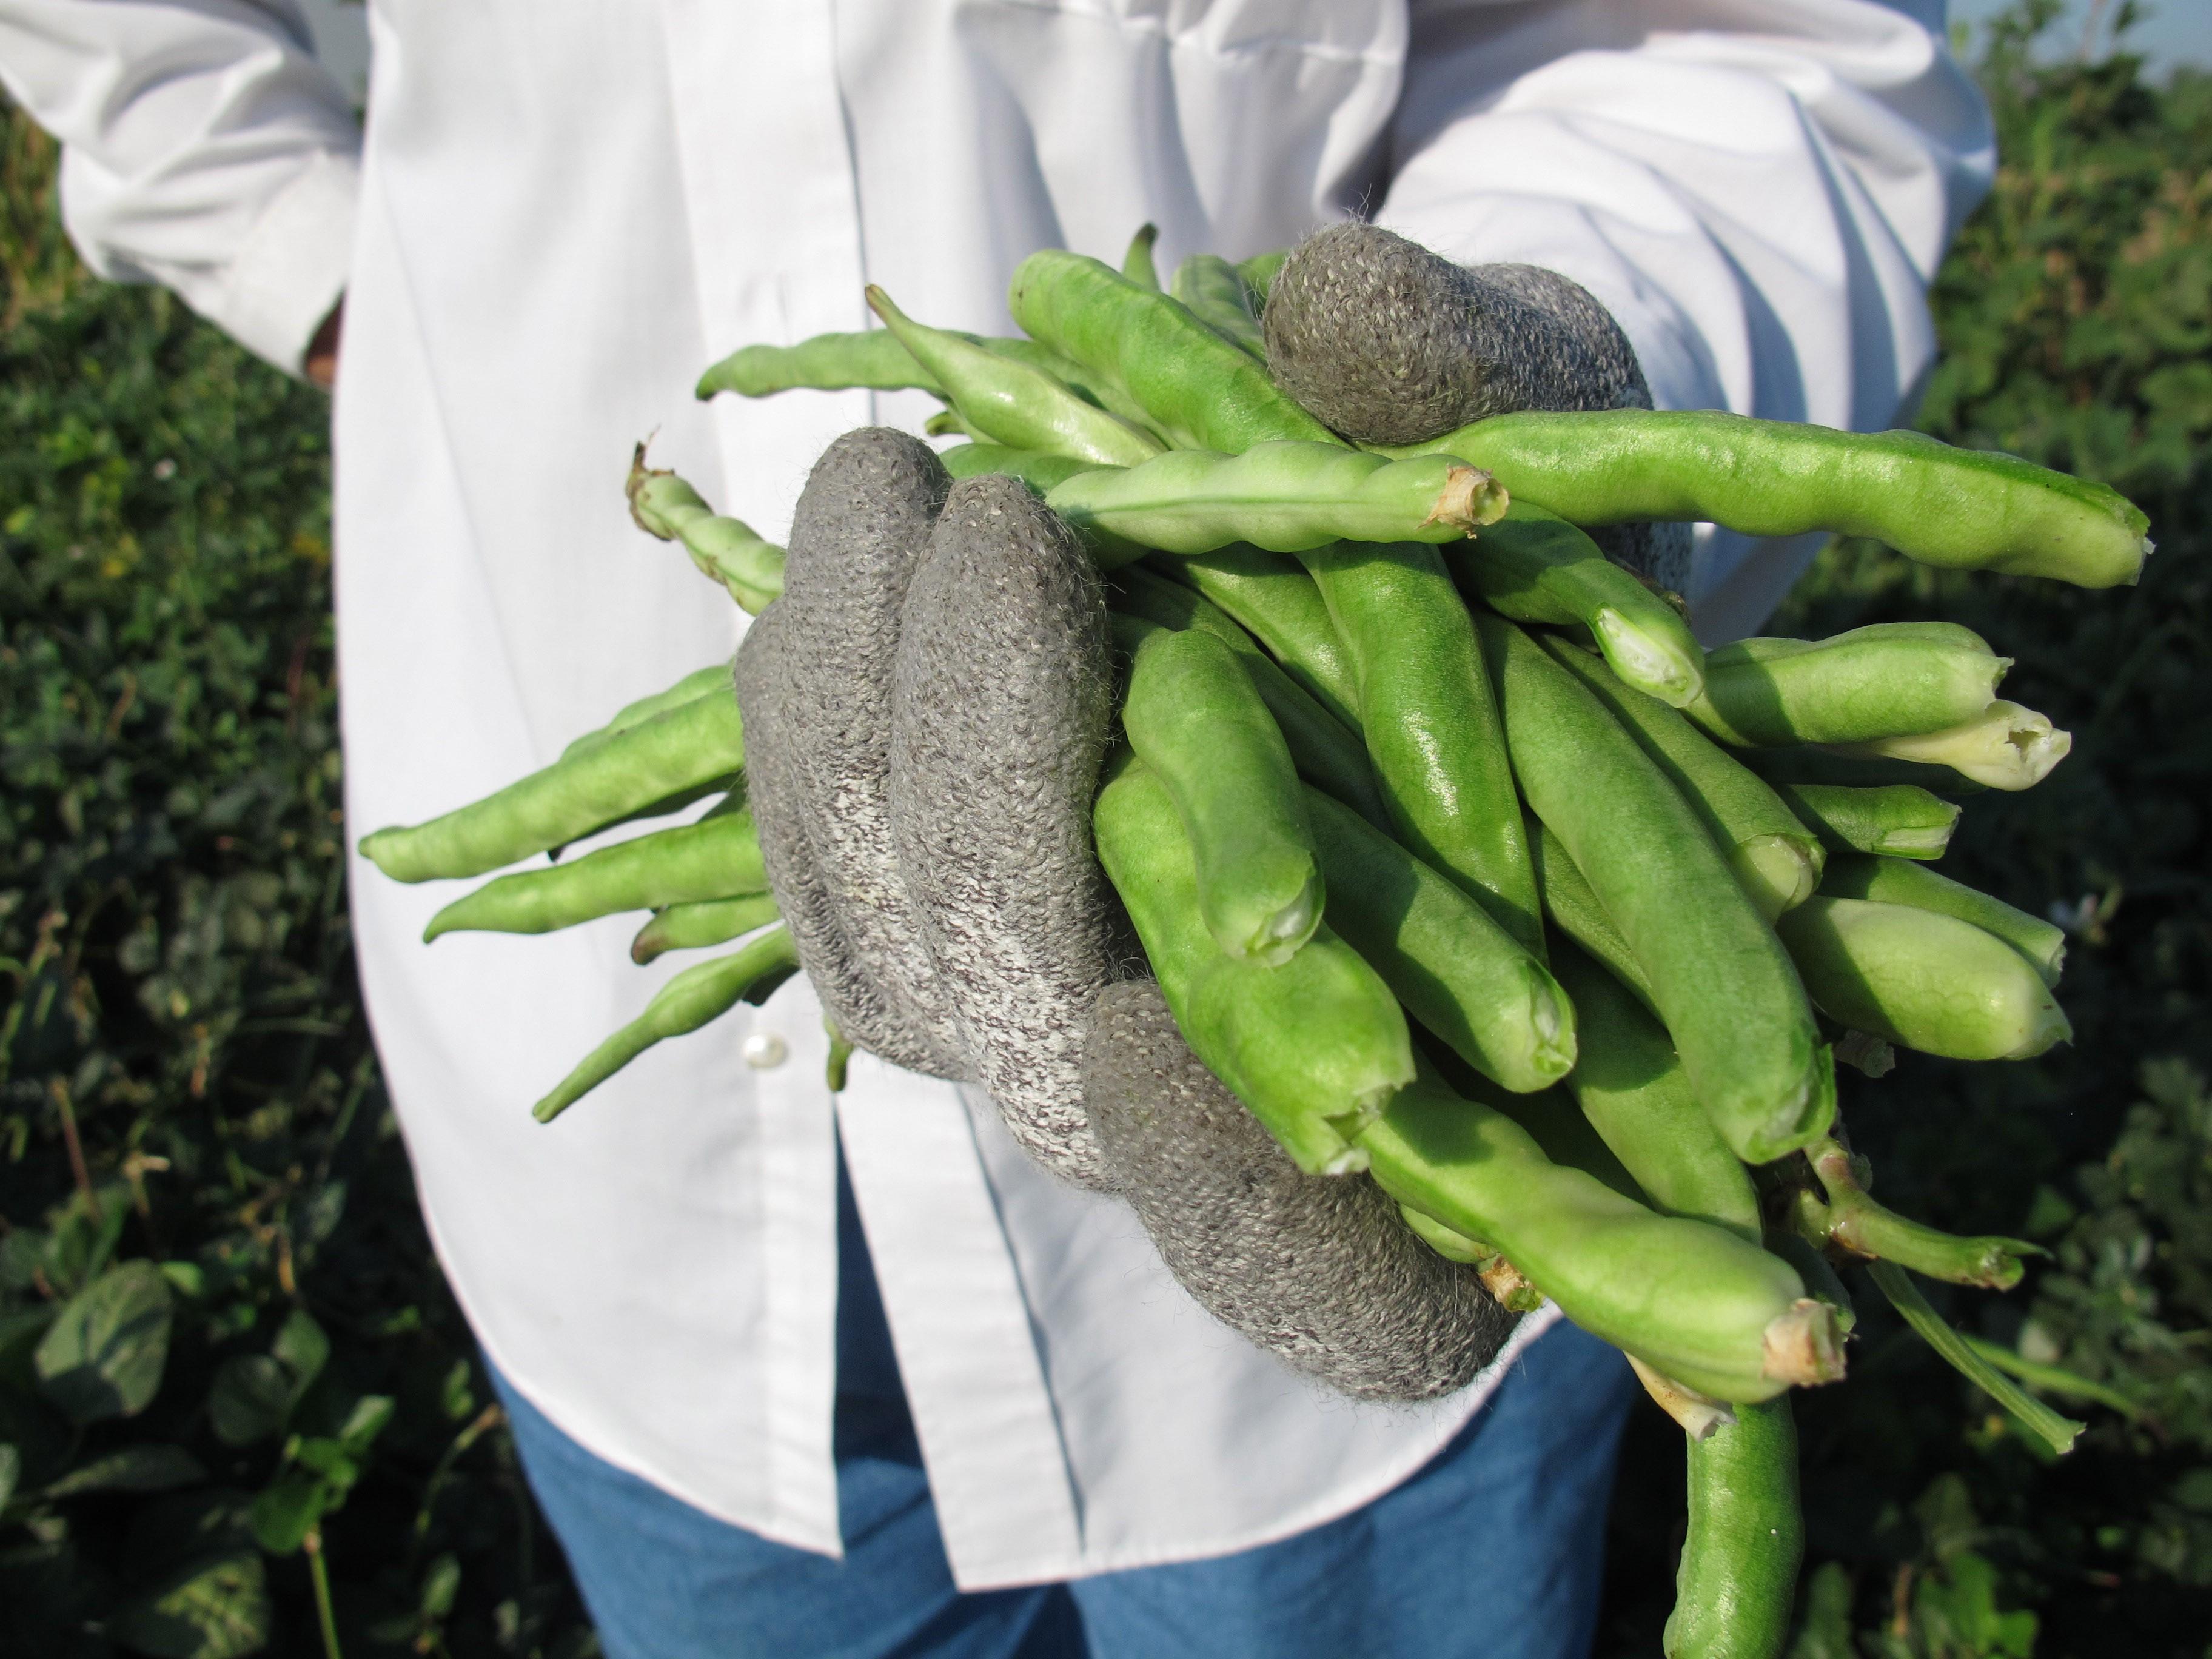 Black-eyed peas in California